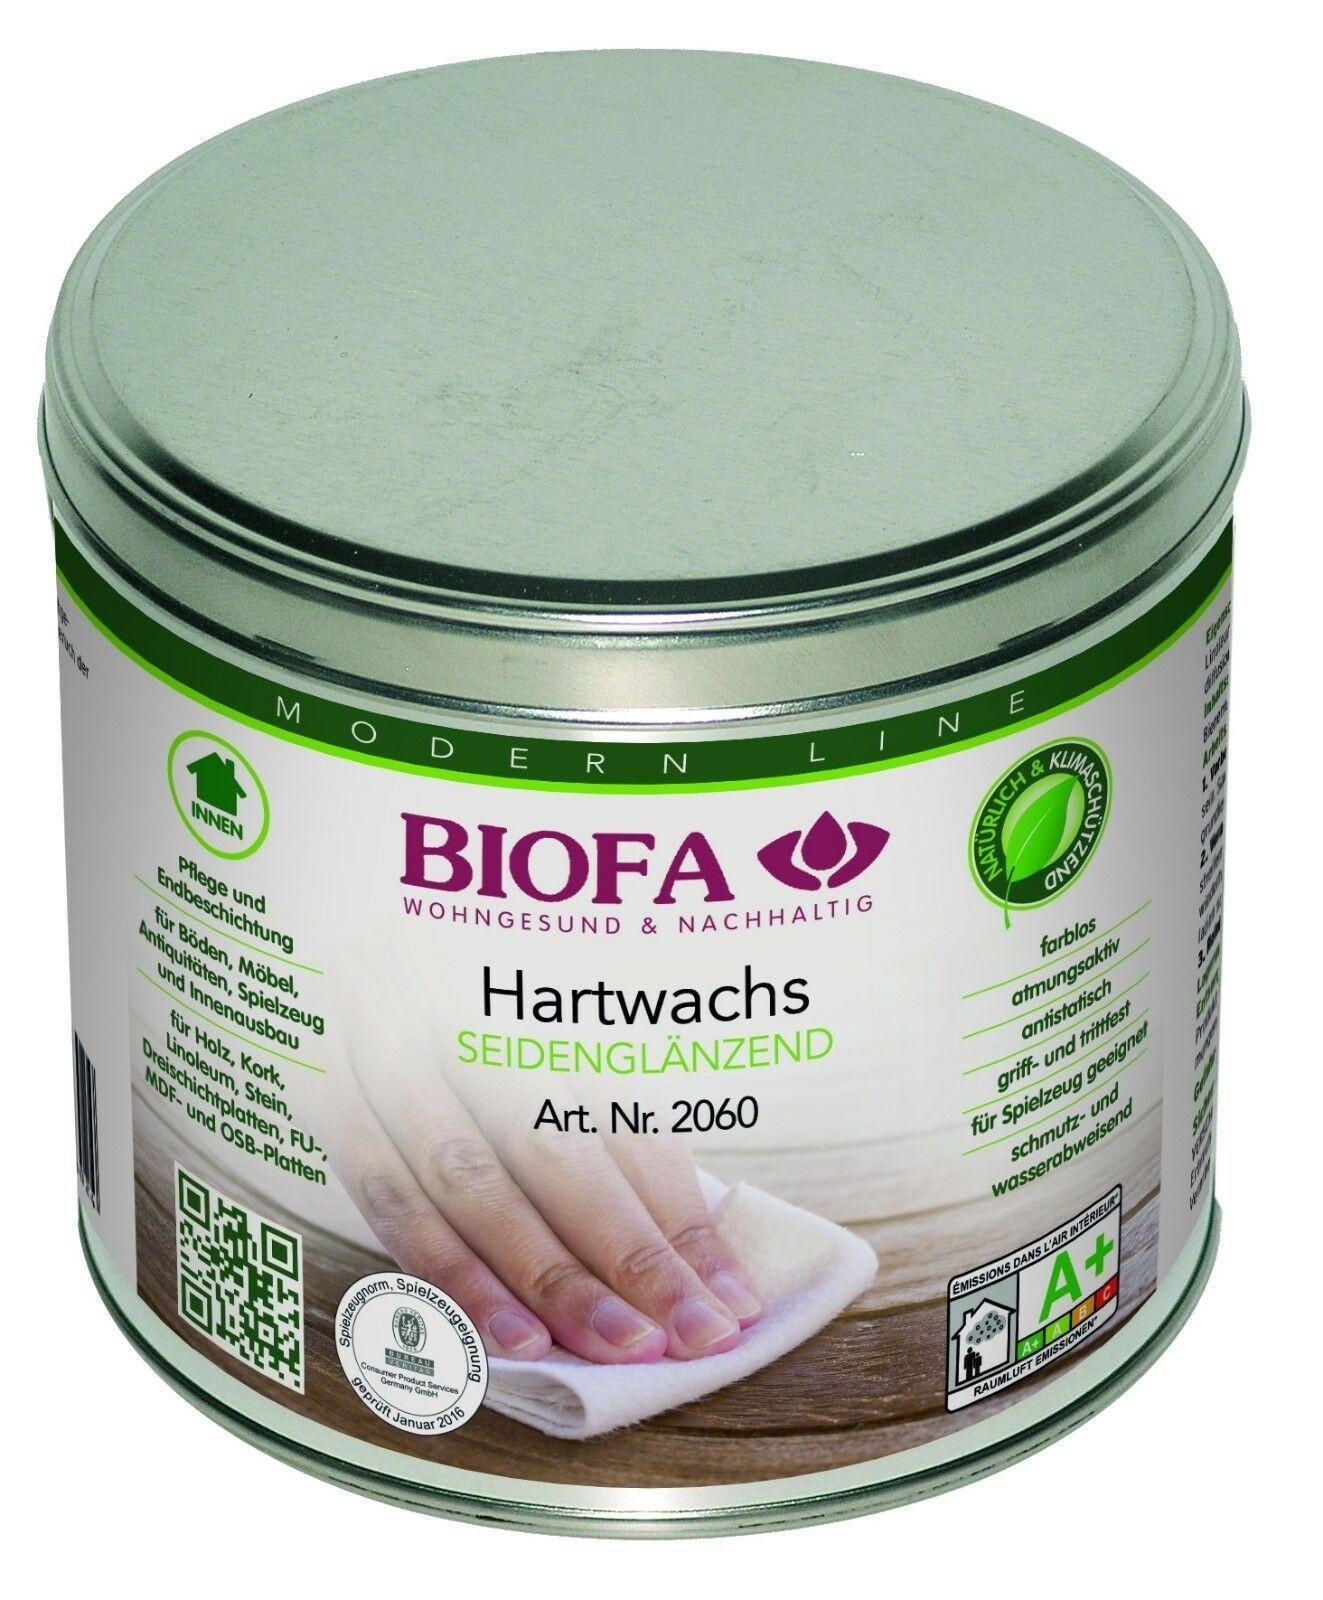 BIOFA Hartwachs 250 ml